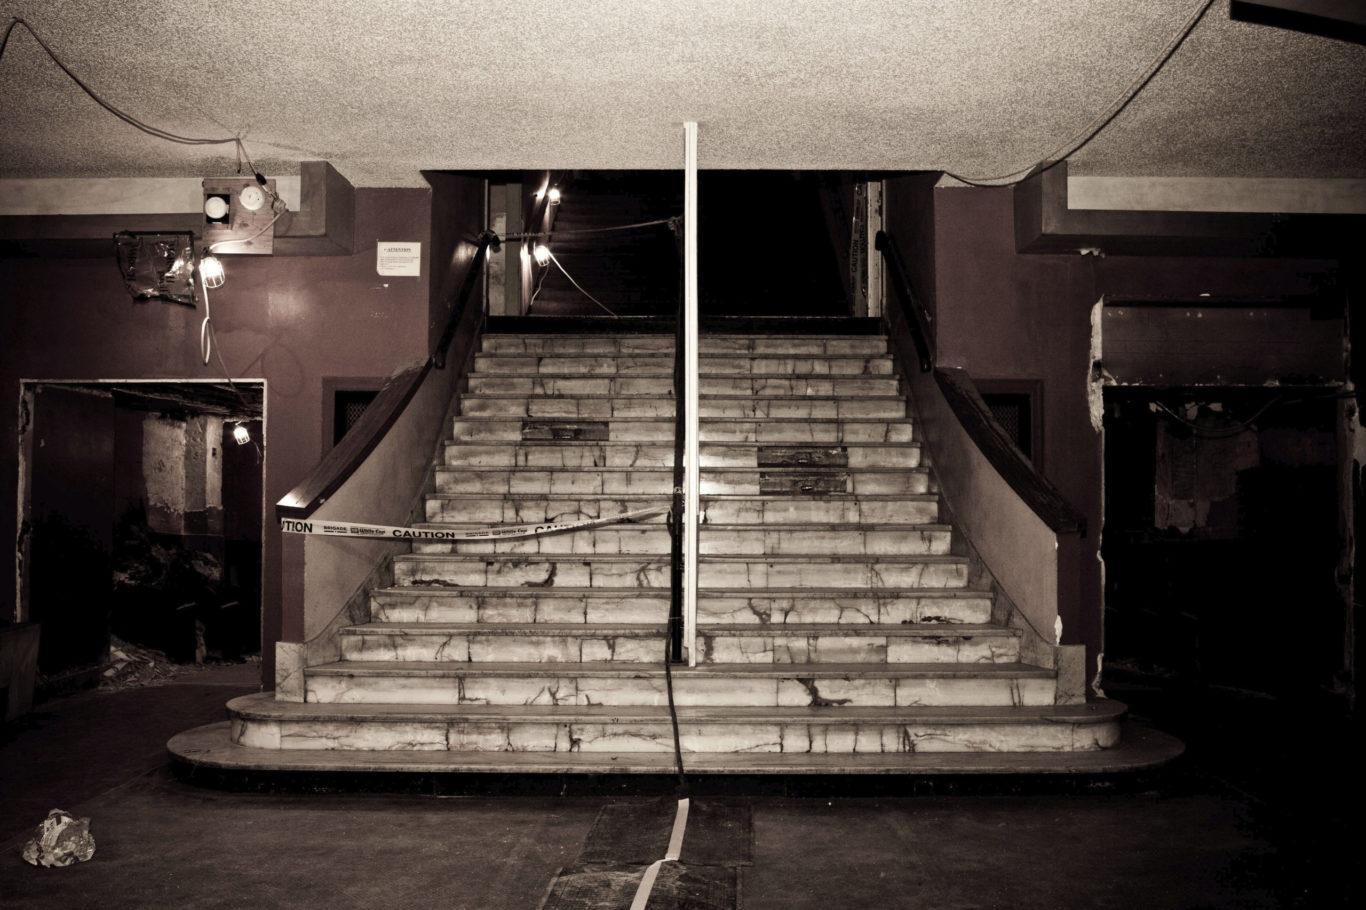 Slide 2 of 8, Stairs